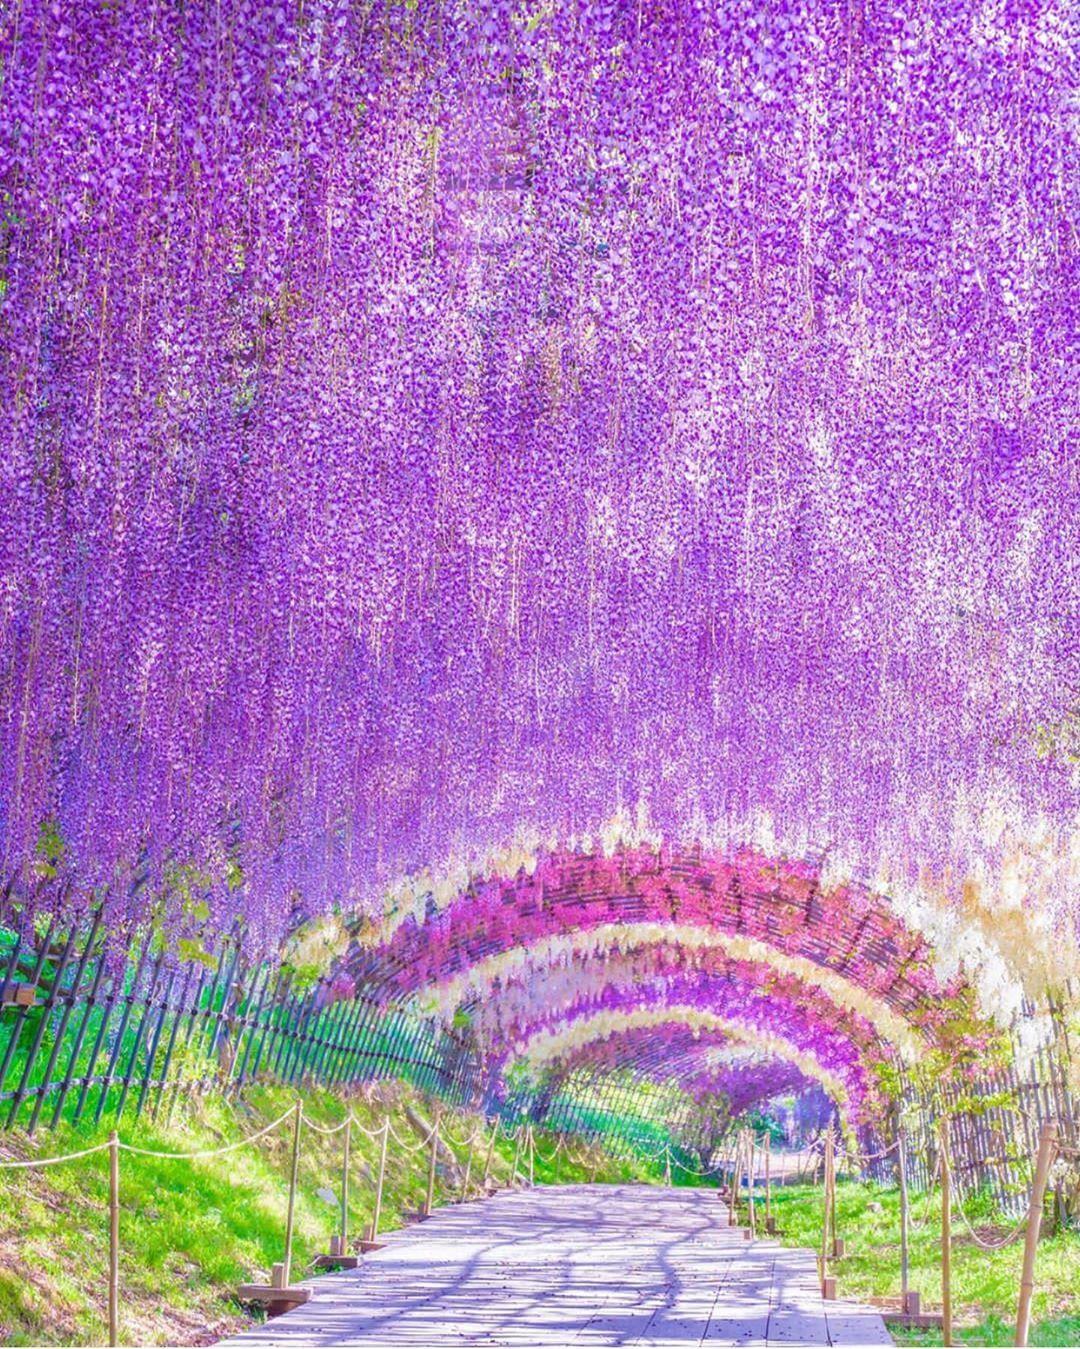 Wonderful Places On Instagram Ashikaga Flower Park Japan Picture By Traveler Sui Wonderf Ashikaga Best Places To Travel Cool Places To Visit